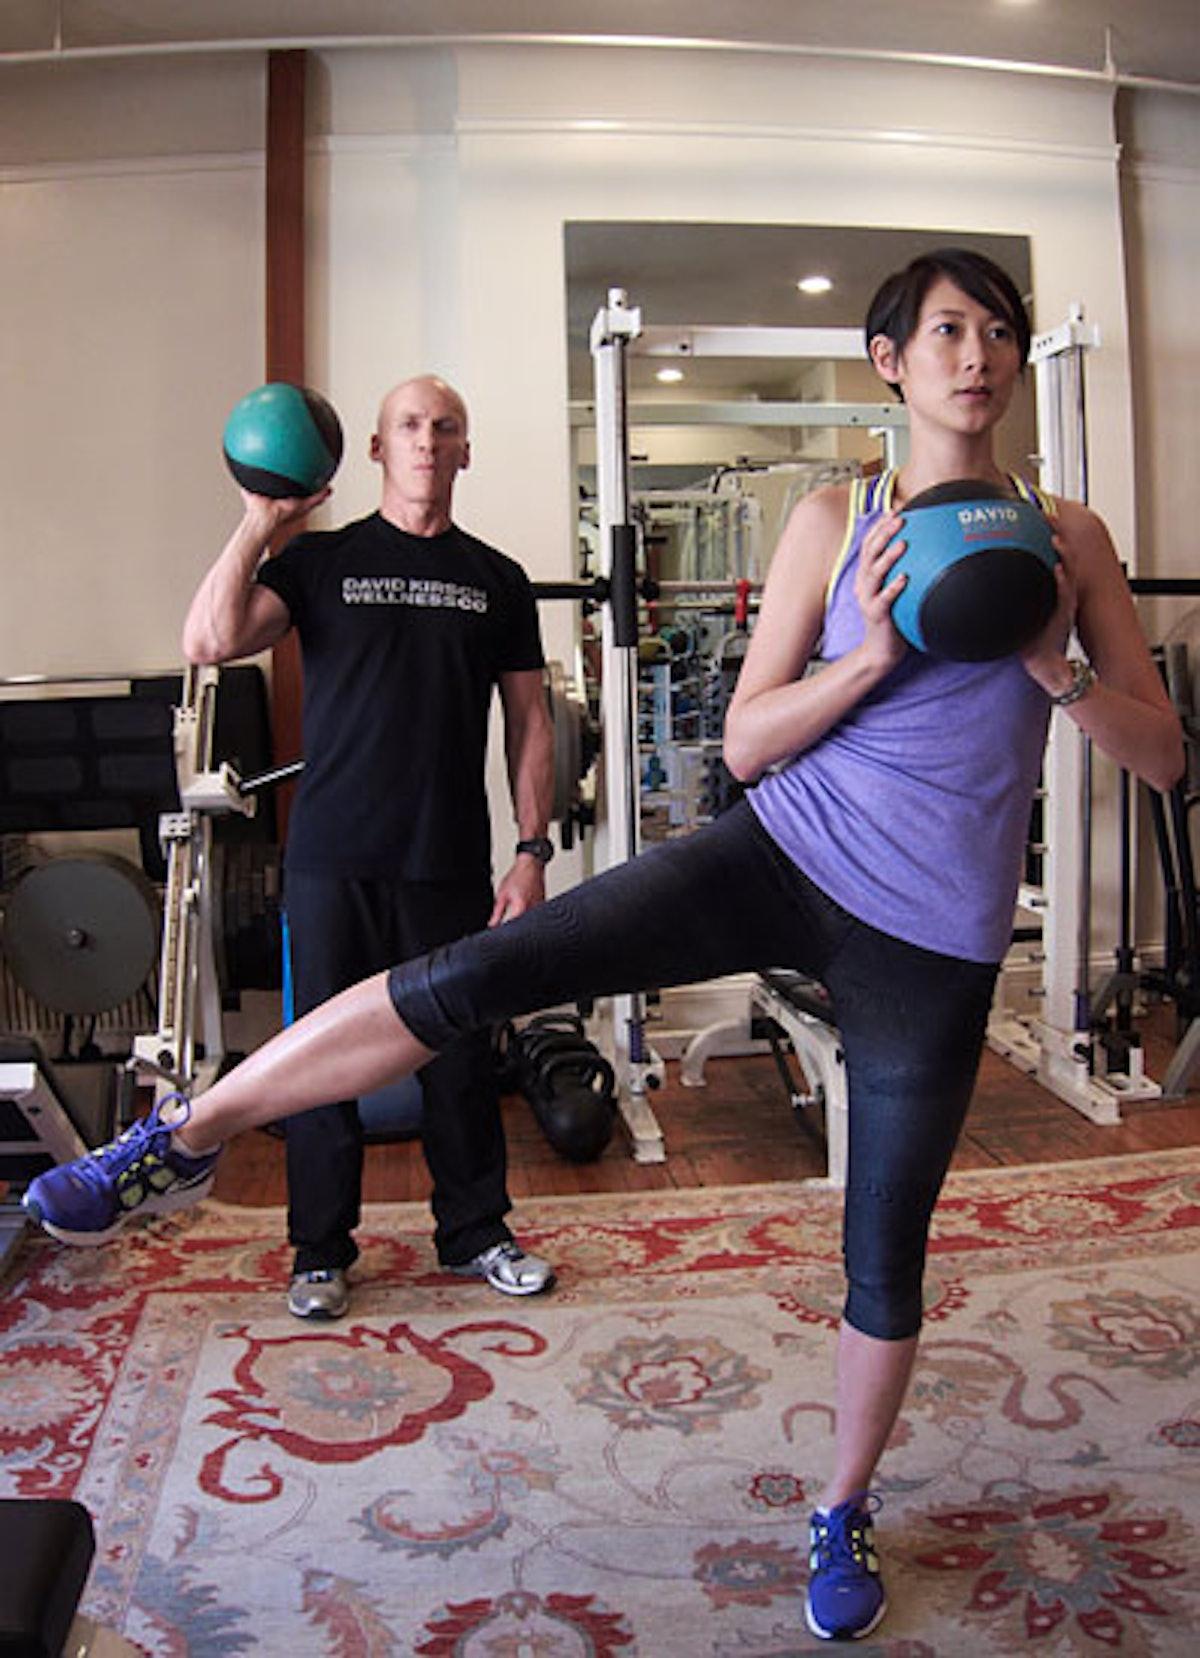 bess-christina-han-booty-workout-01-v.jpg